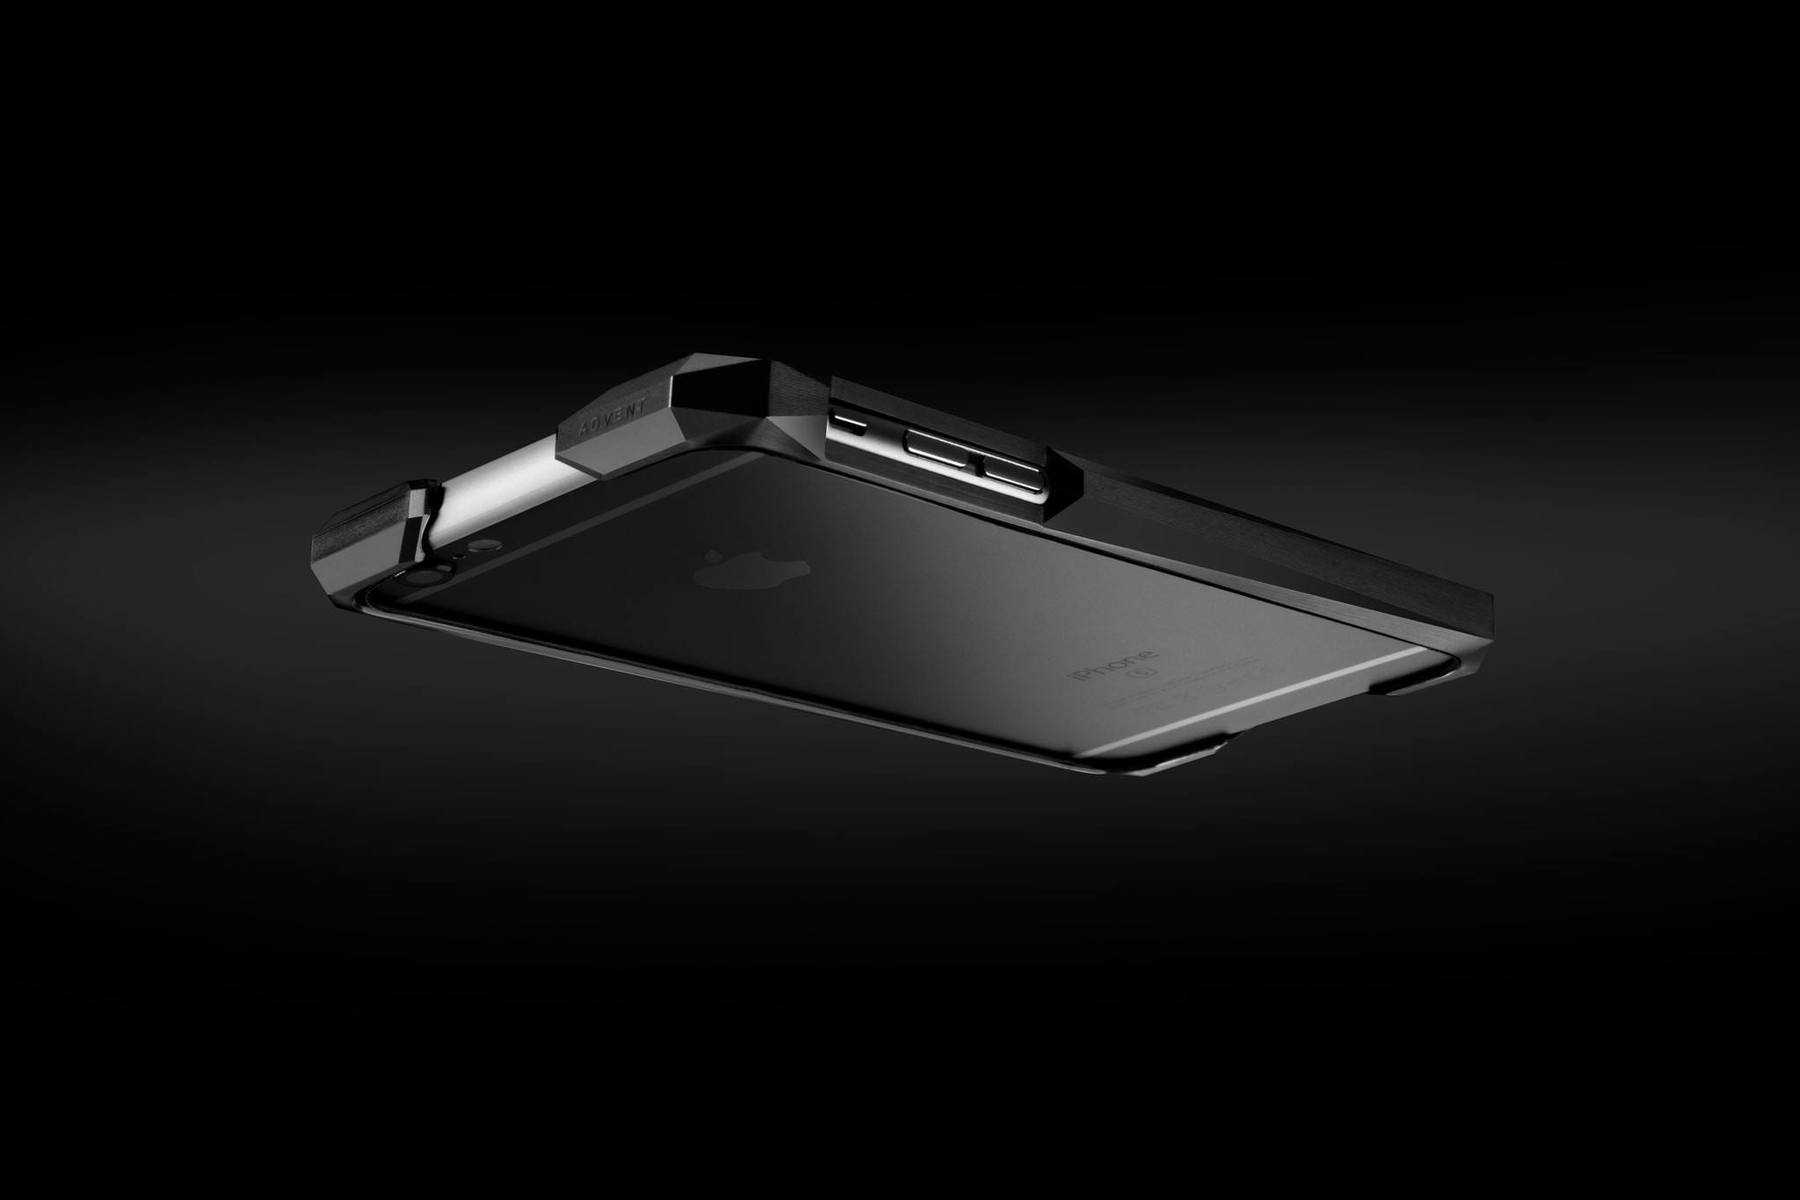 Gray International iPhone 7 case 6